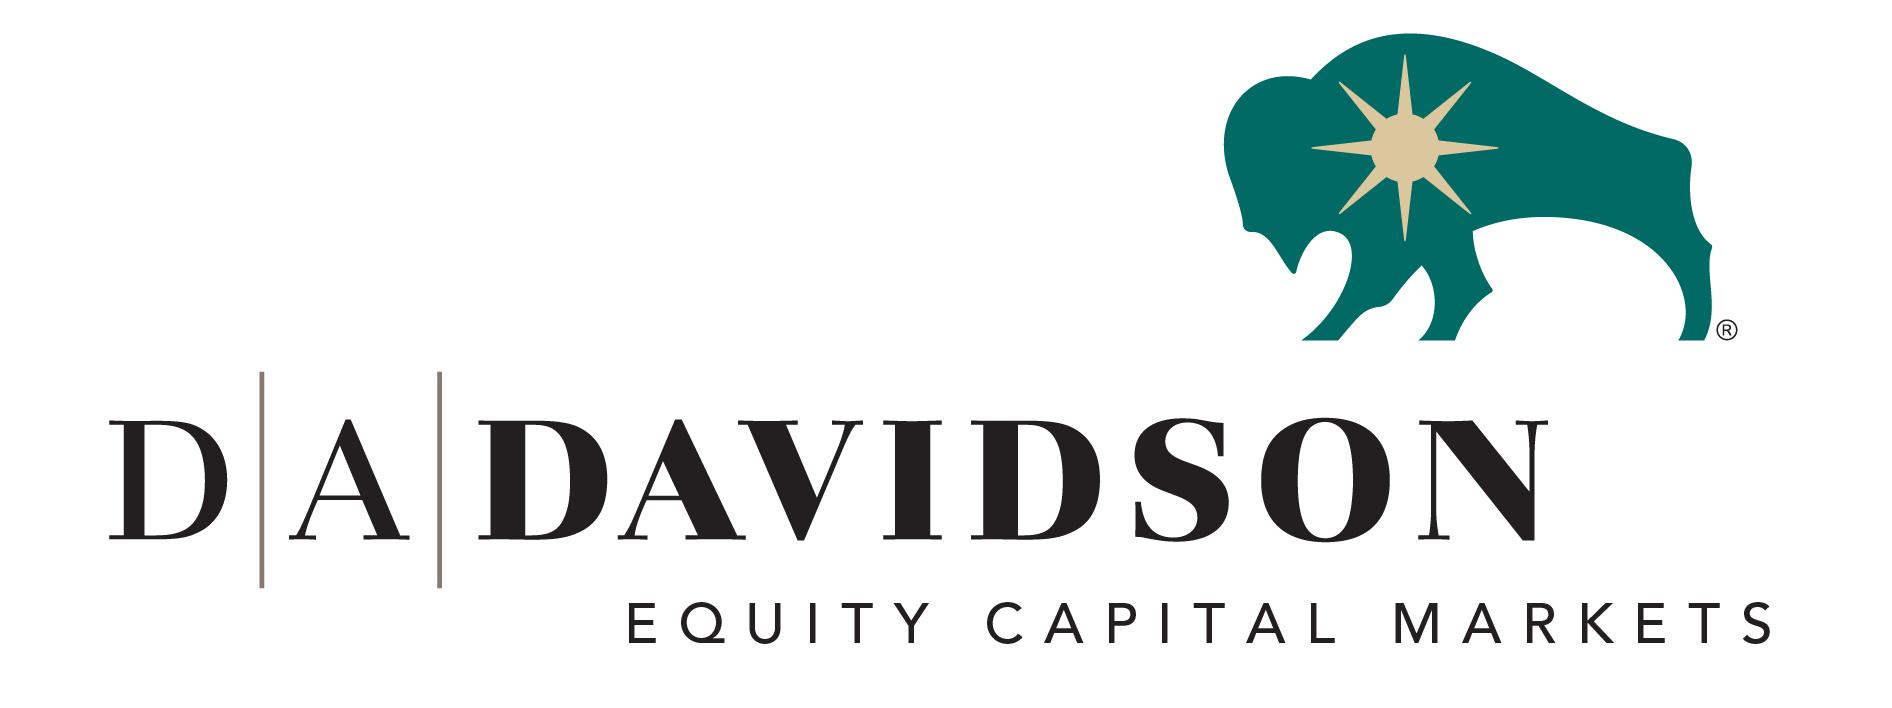 D.A. Davidson FICM Logo - JPEG.jpg - 154.96 Kb